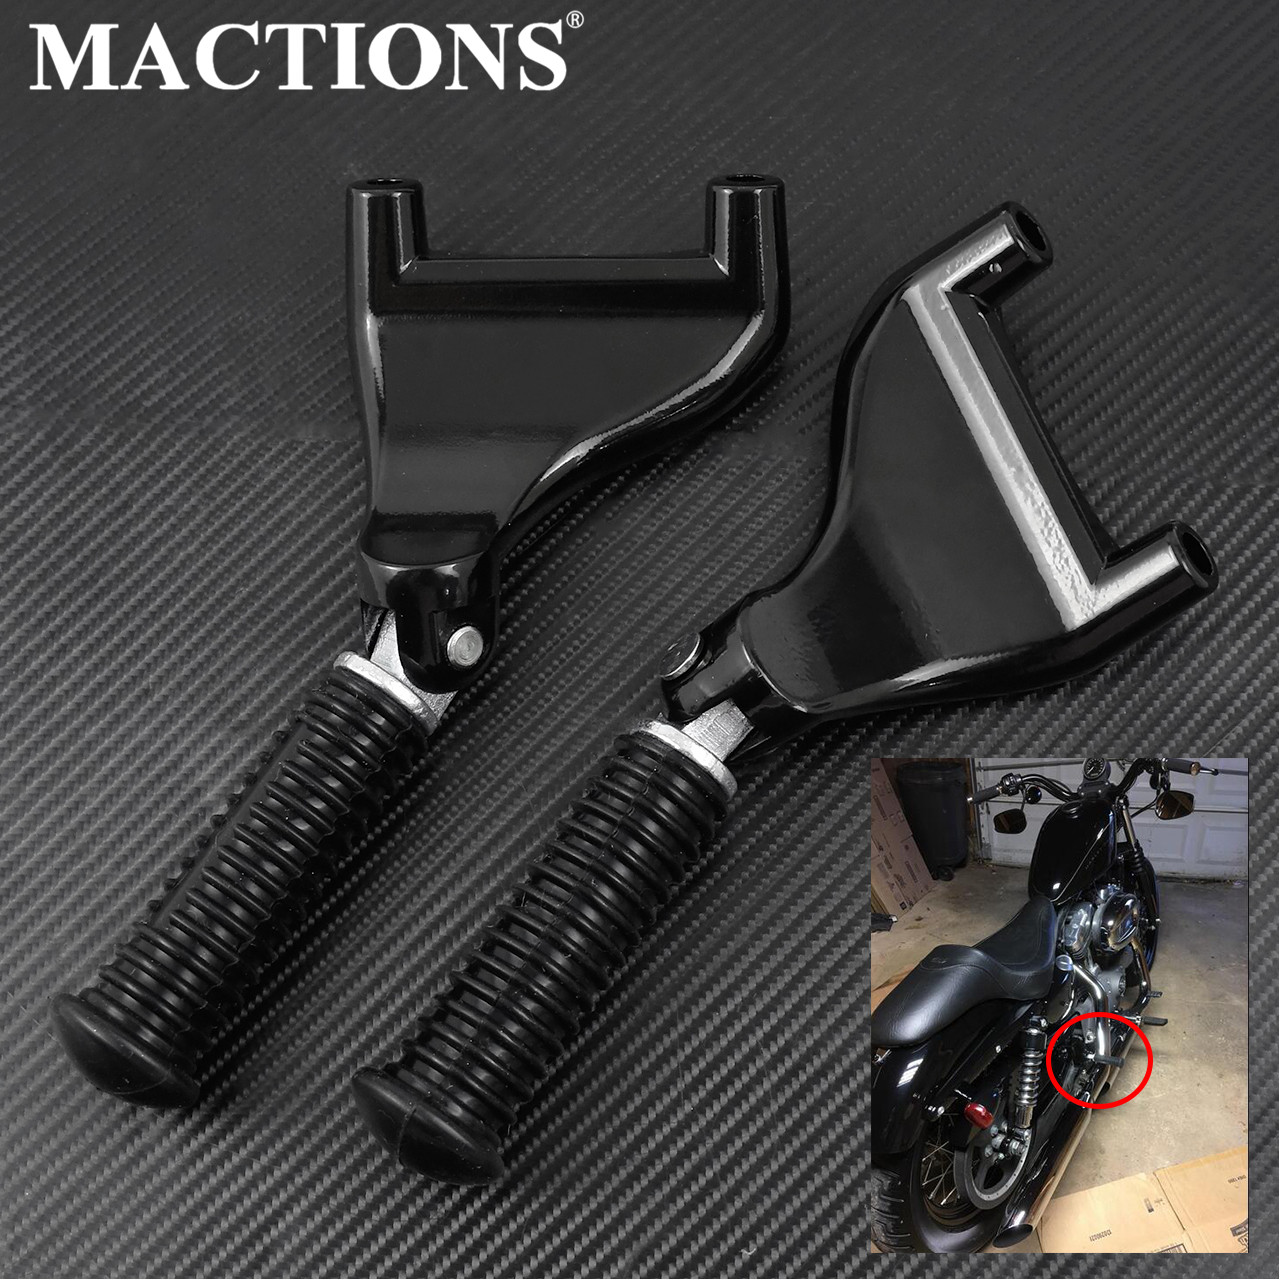 Rear Passenger FootPegs Mount Kit For Harley Sportster XL 883 1200 2014-2019 15